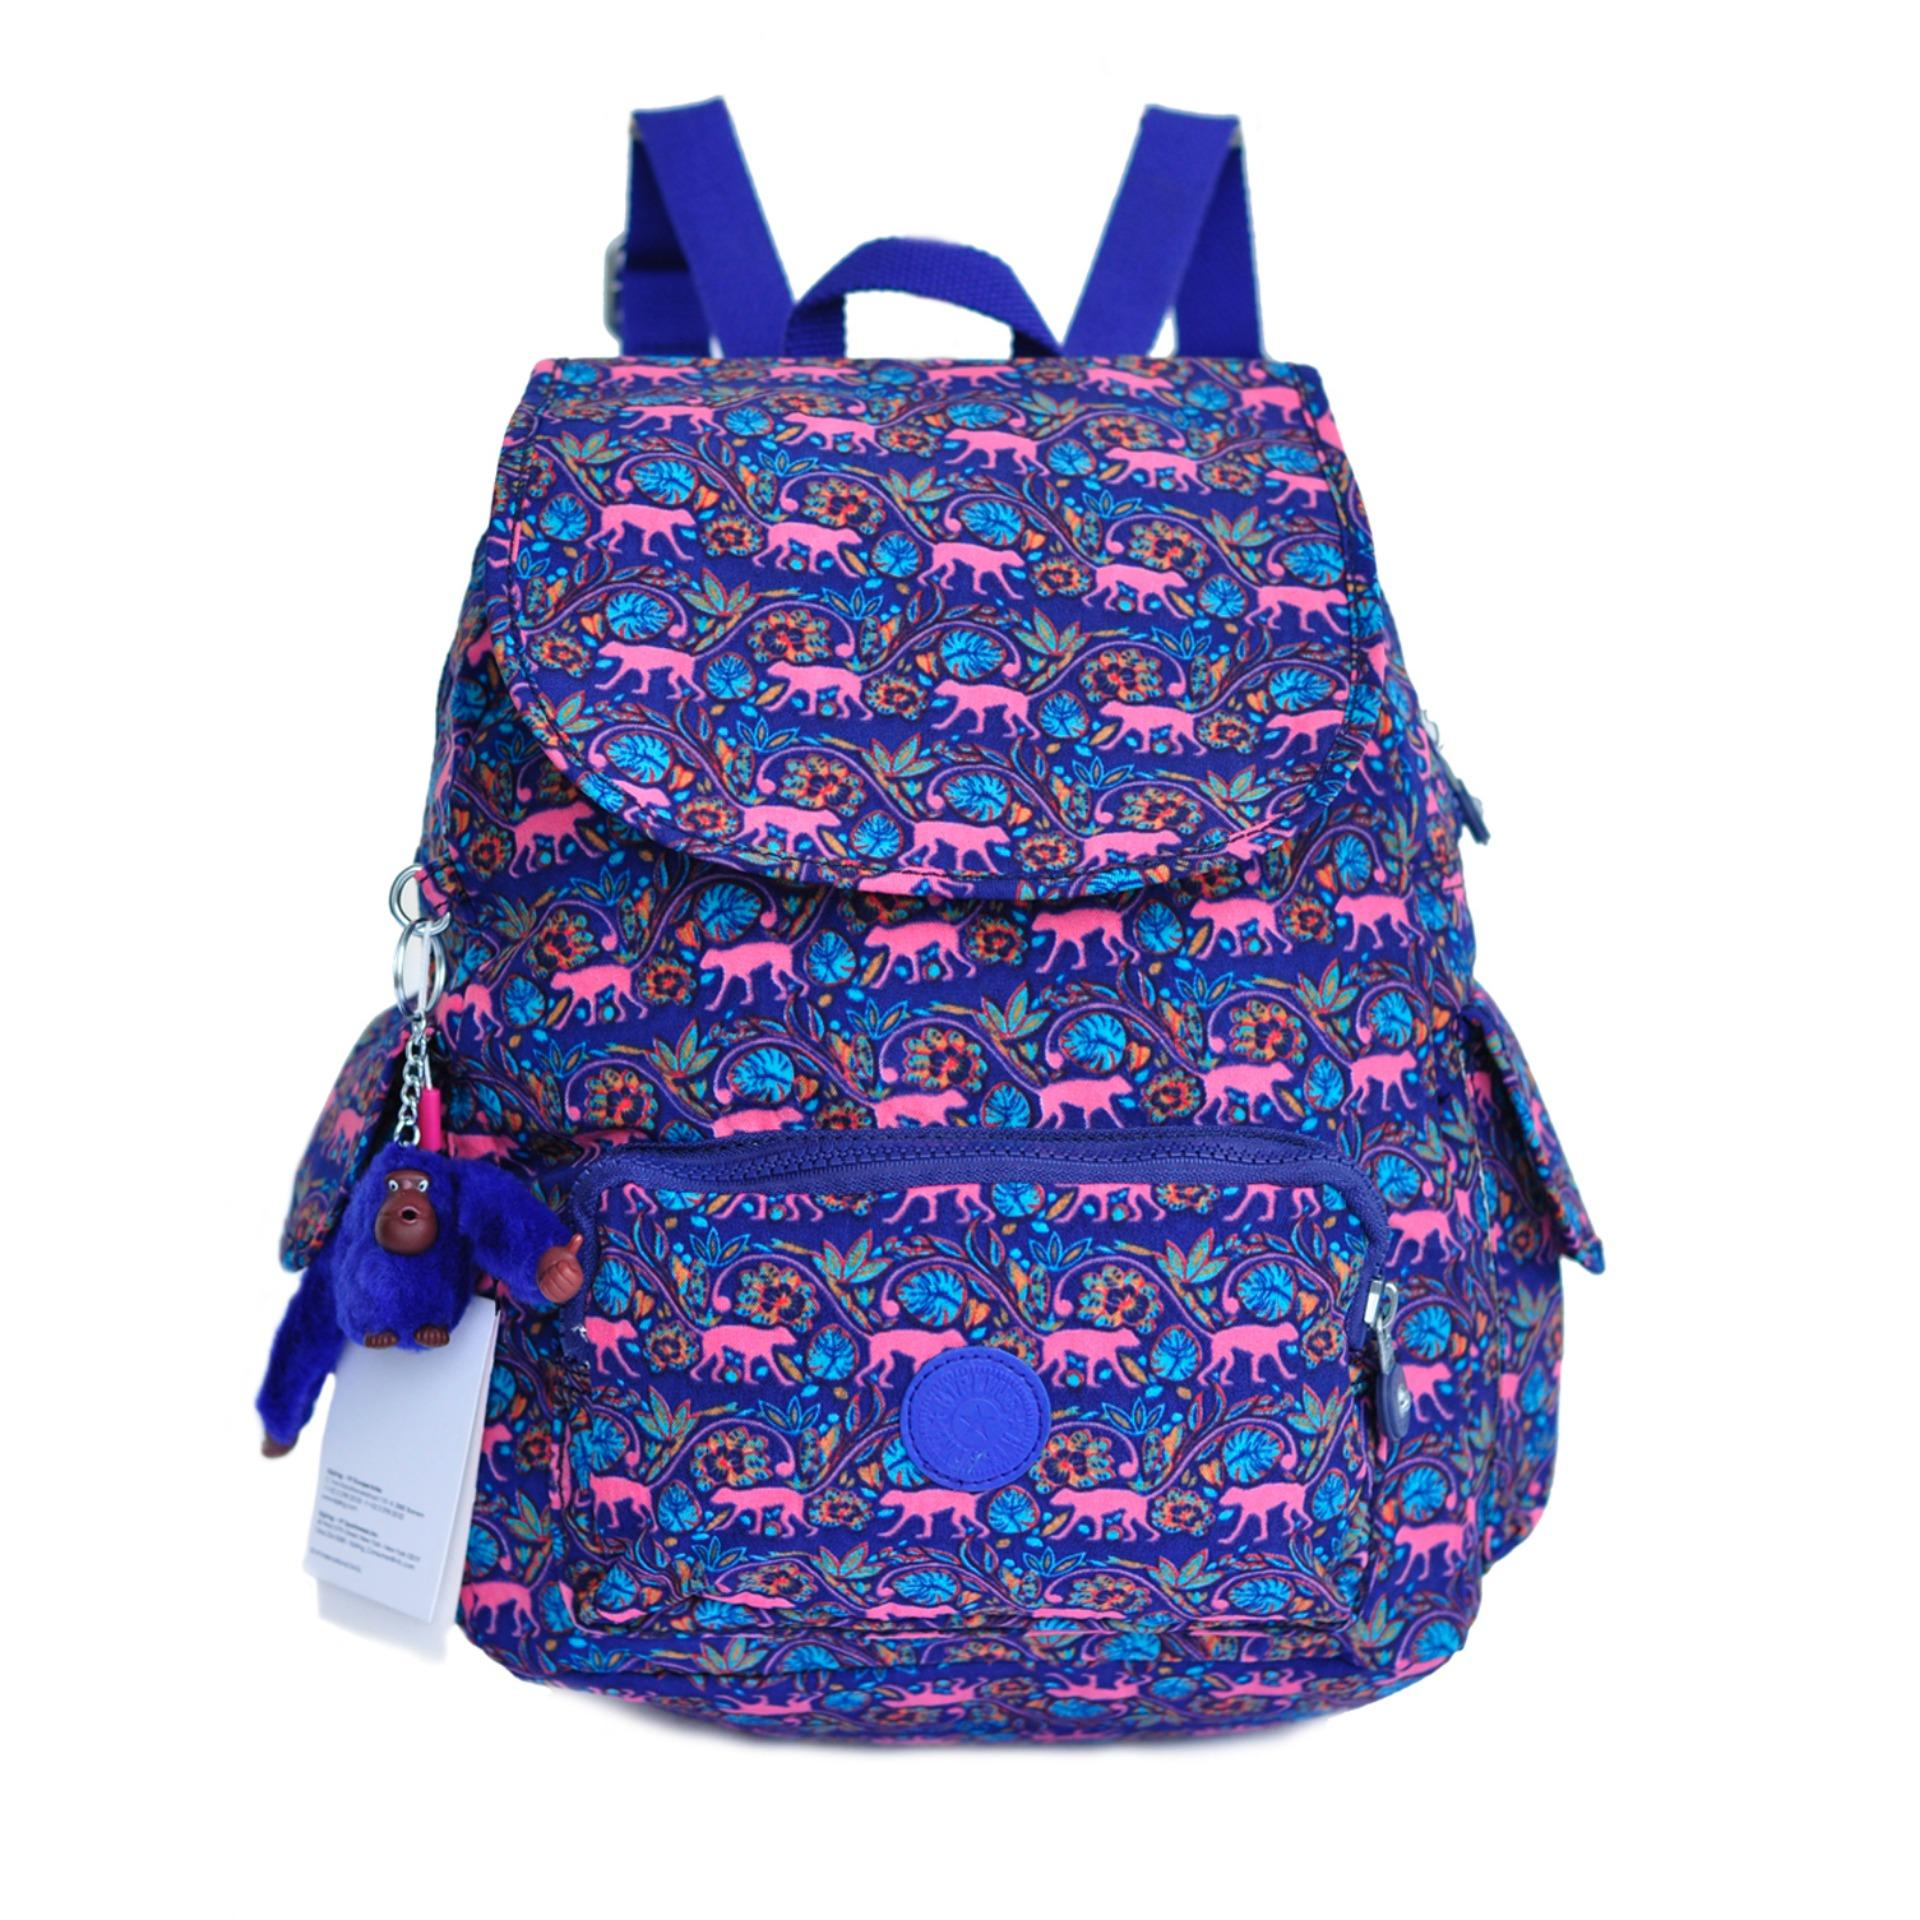 Tas Ransel Wanita Authentic Kipling Backpack City - Biru